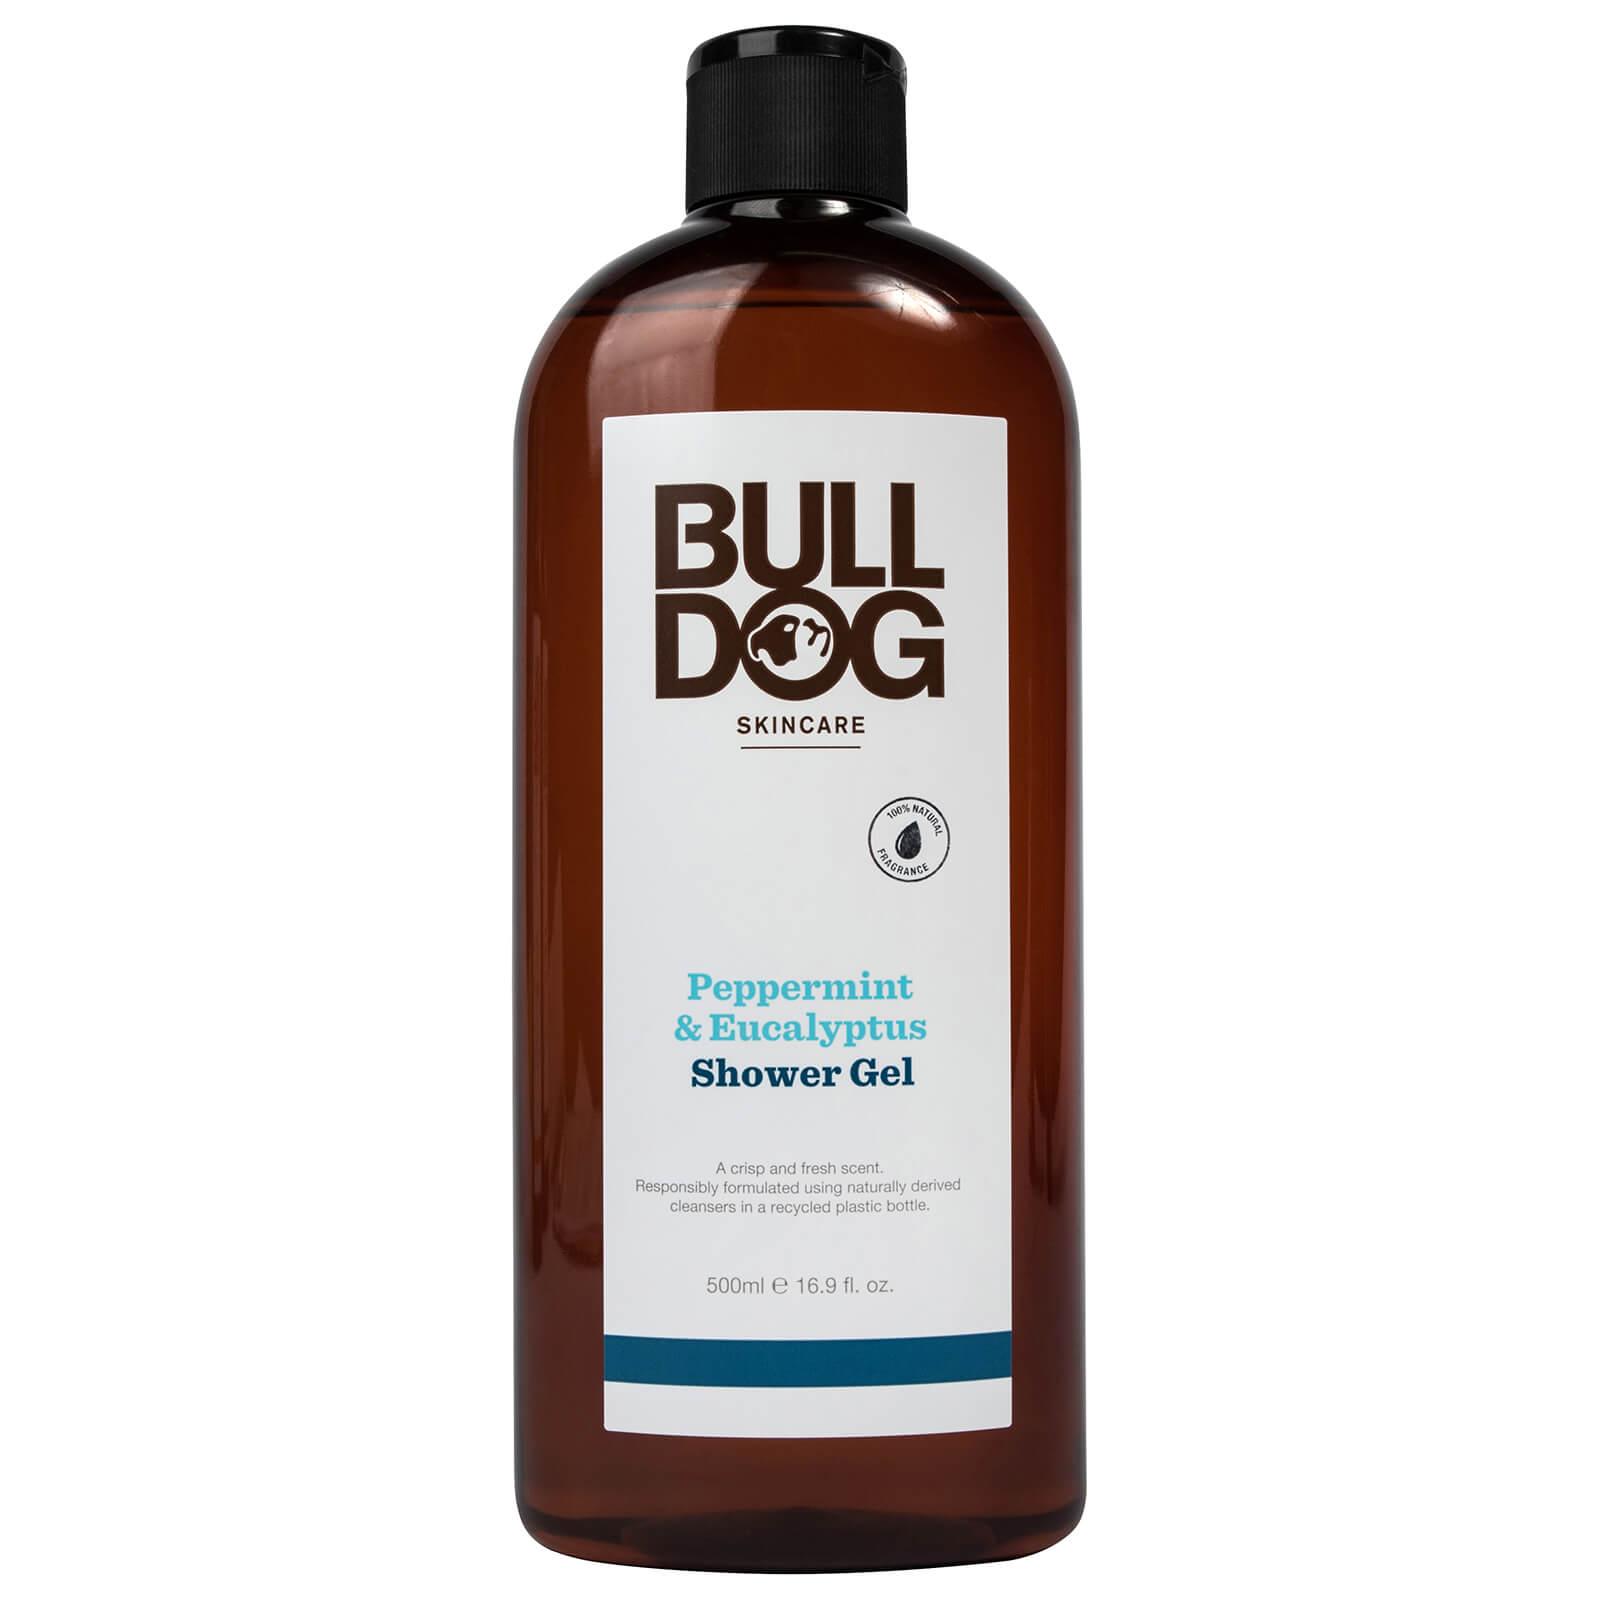 Купить Bulldog Peppermint & Eucalyptus Shower Gel 500ml